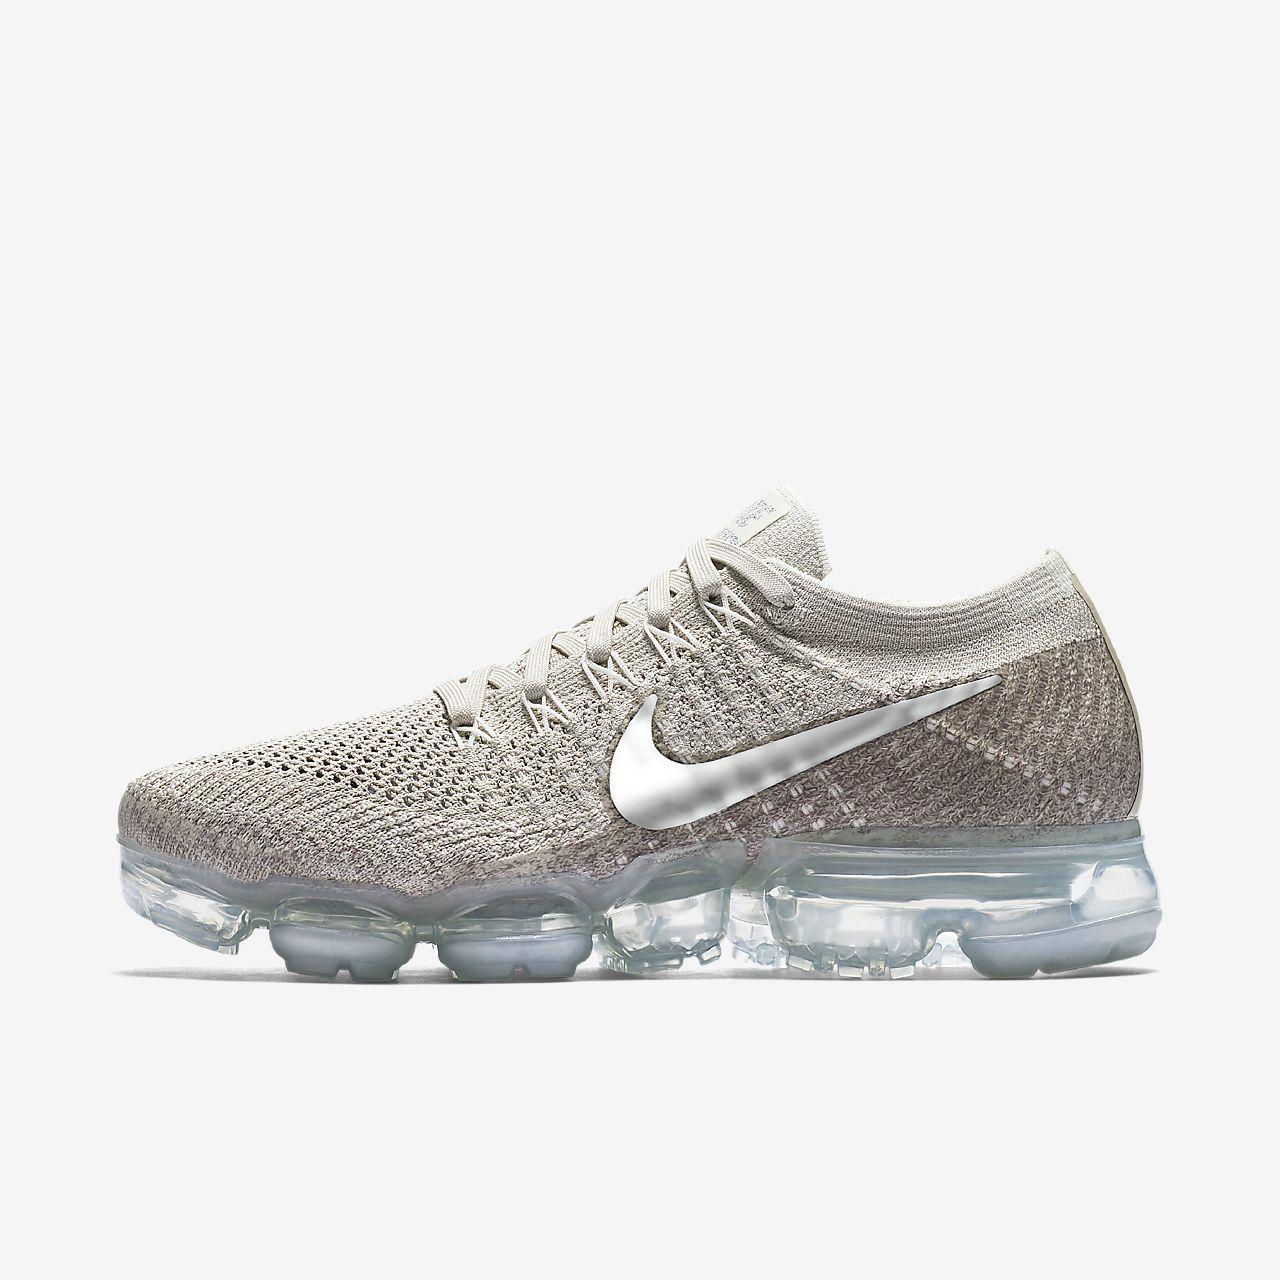 6e91246f78d78 Nike Air VaporMax Flyknit Women s Running Shoe